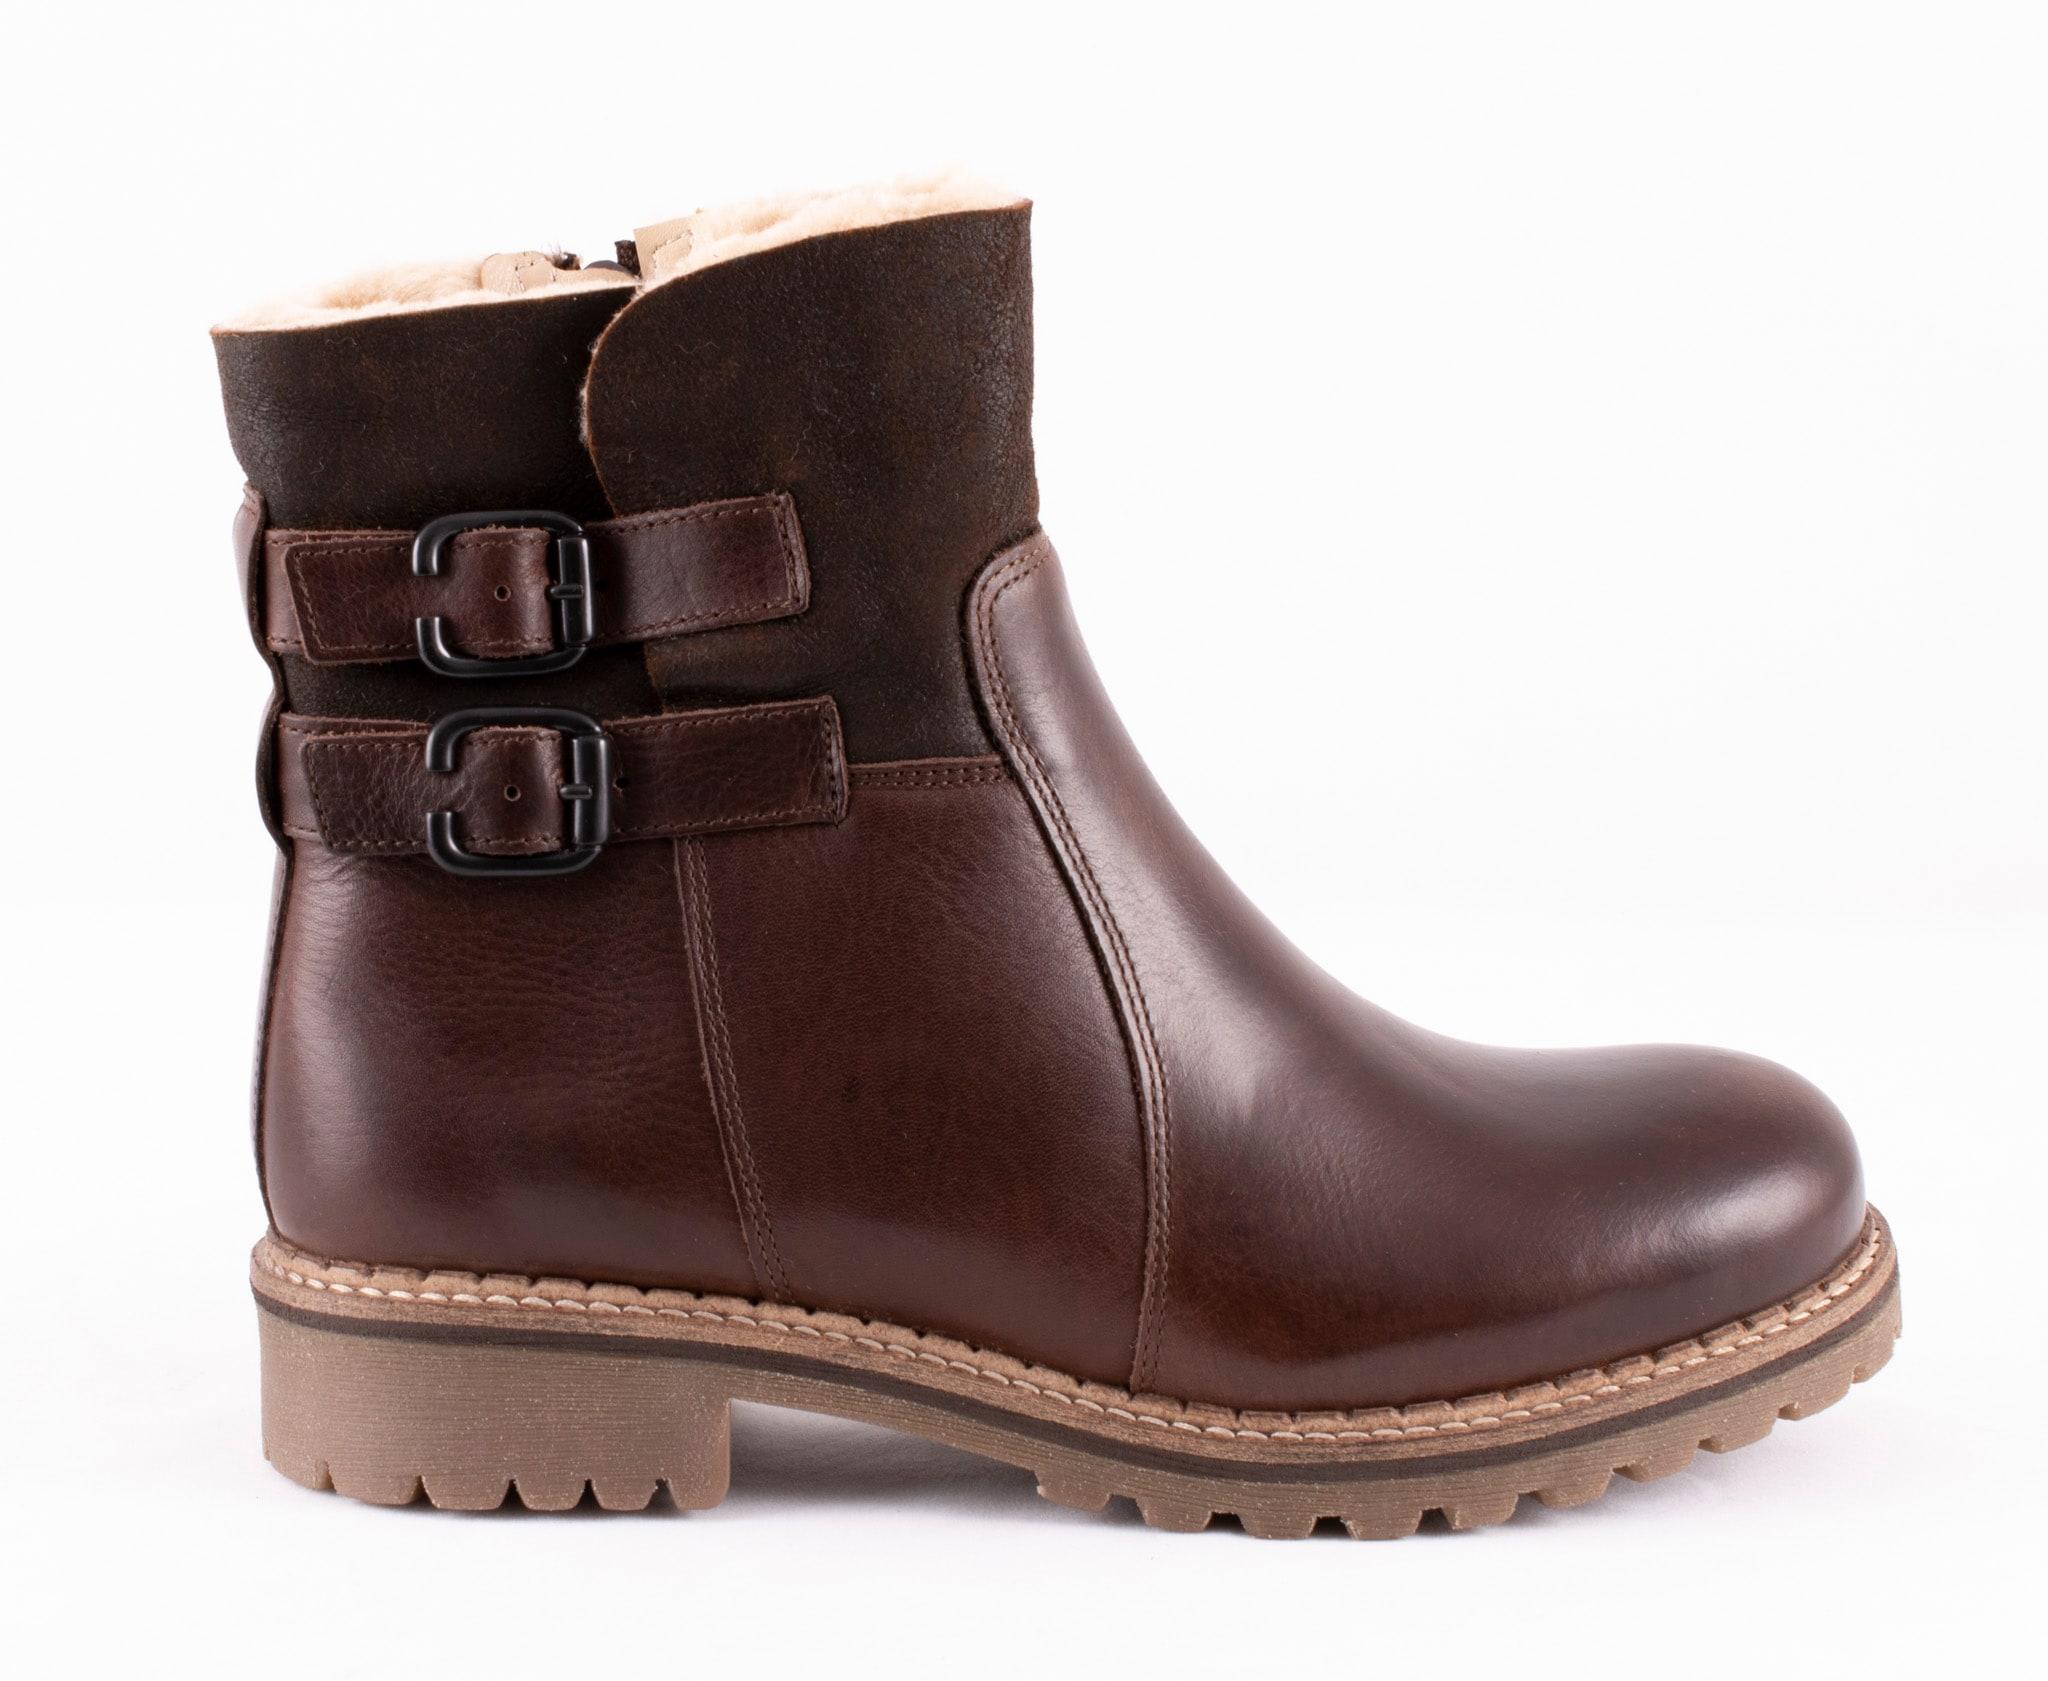 Smilla ankelhöga boots